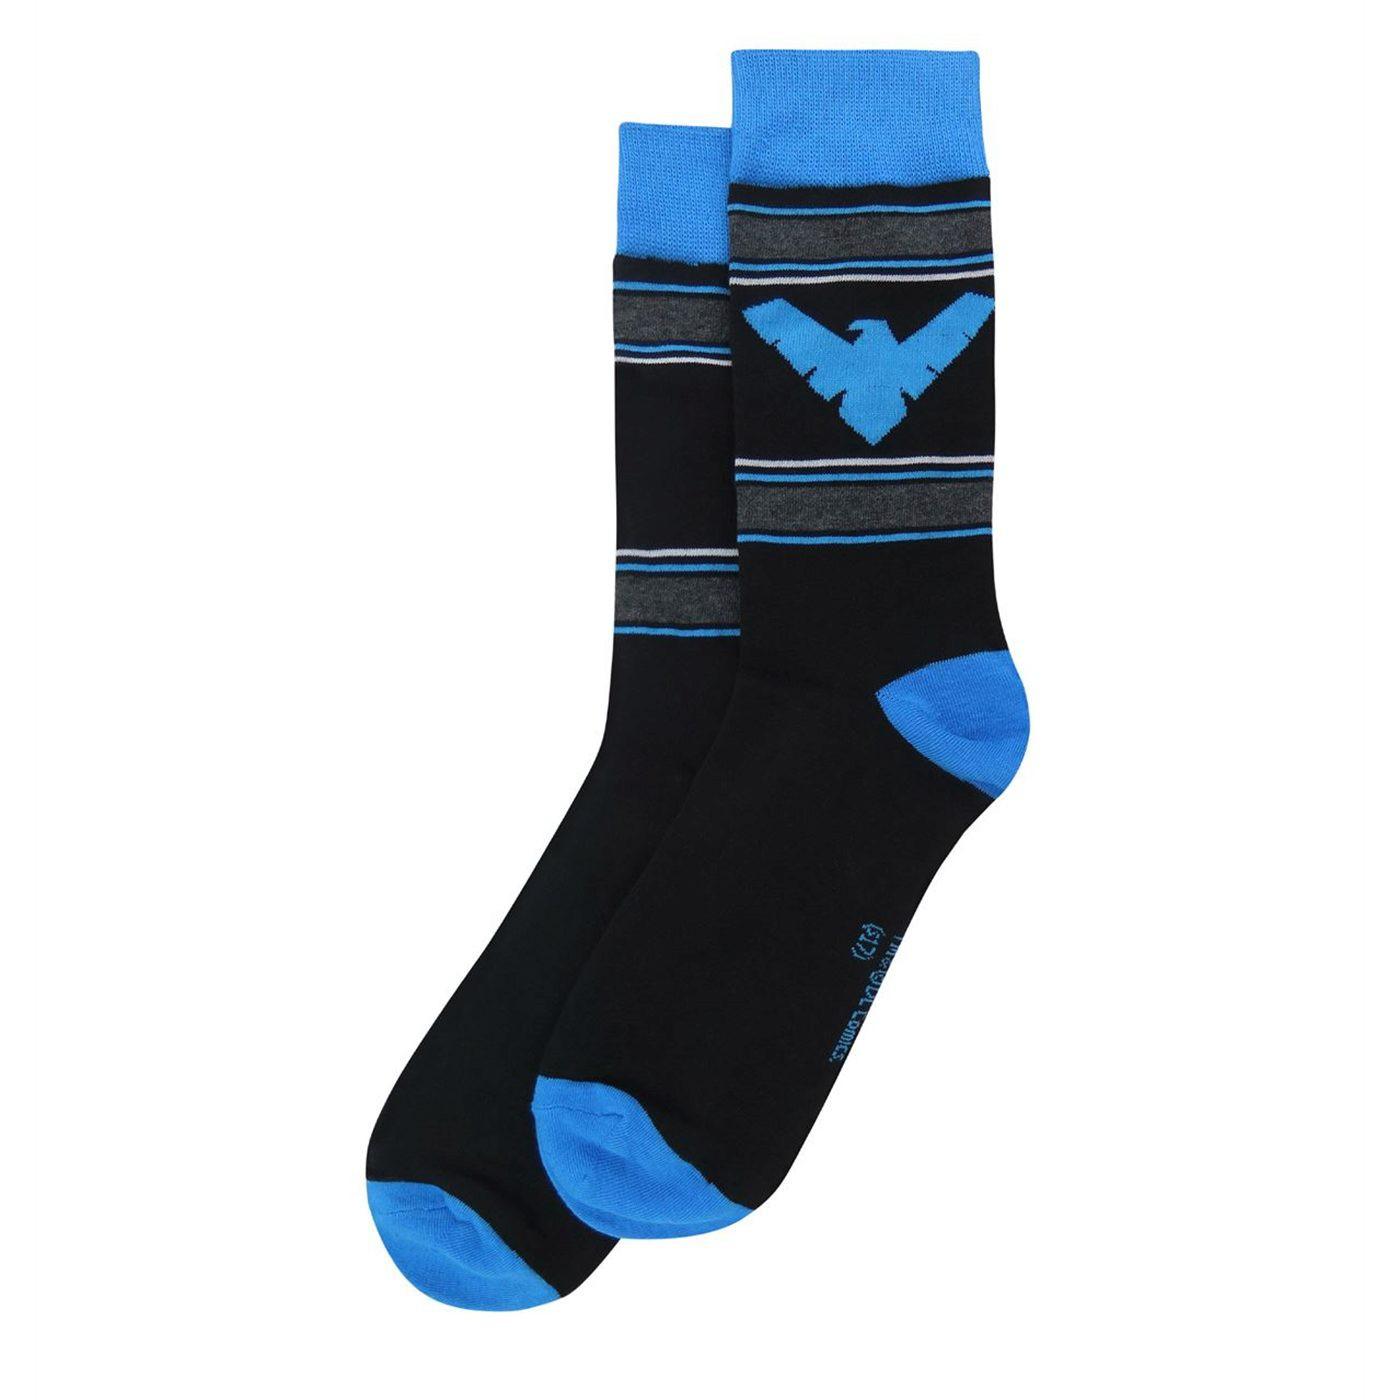 Nightwing Athletic Crew Socks